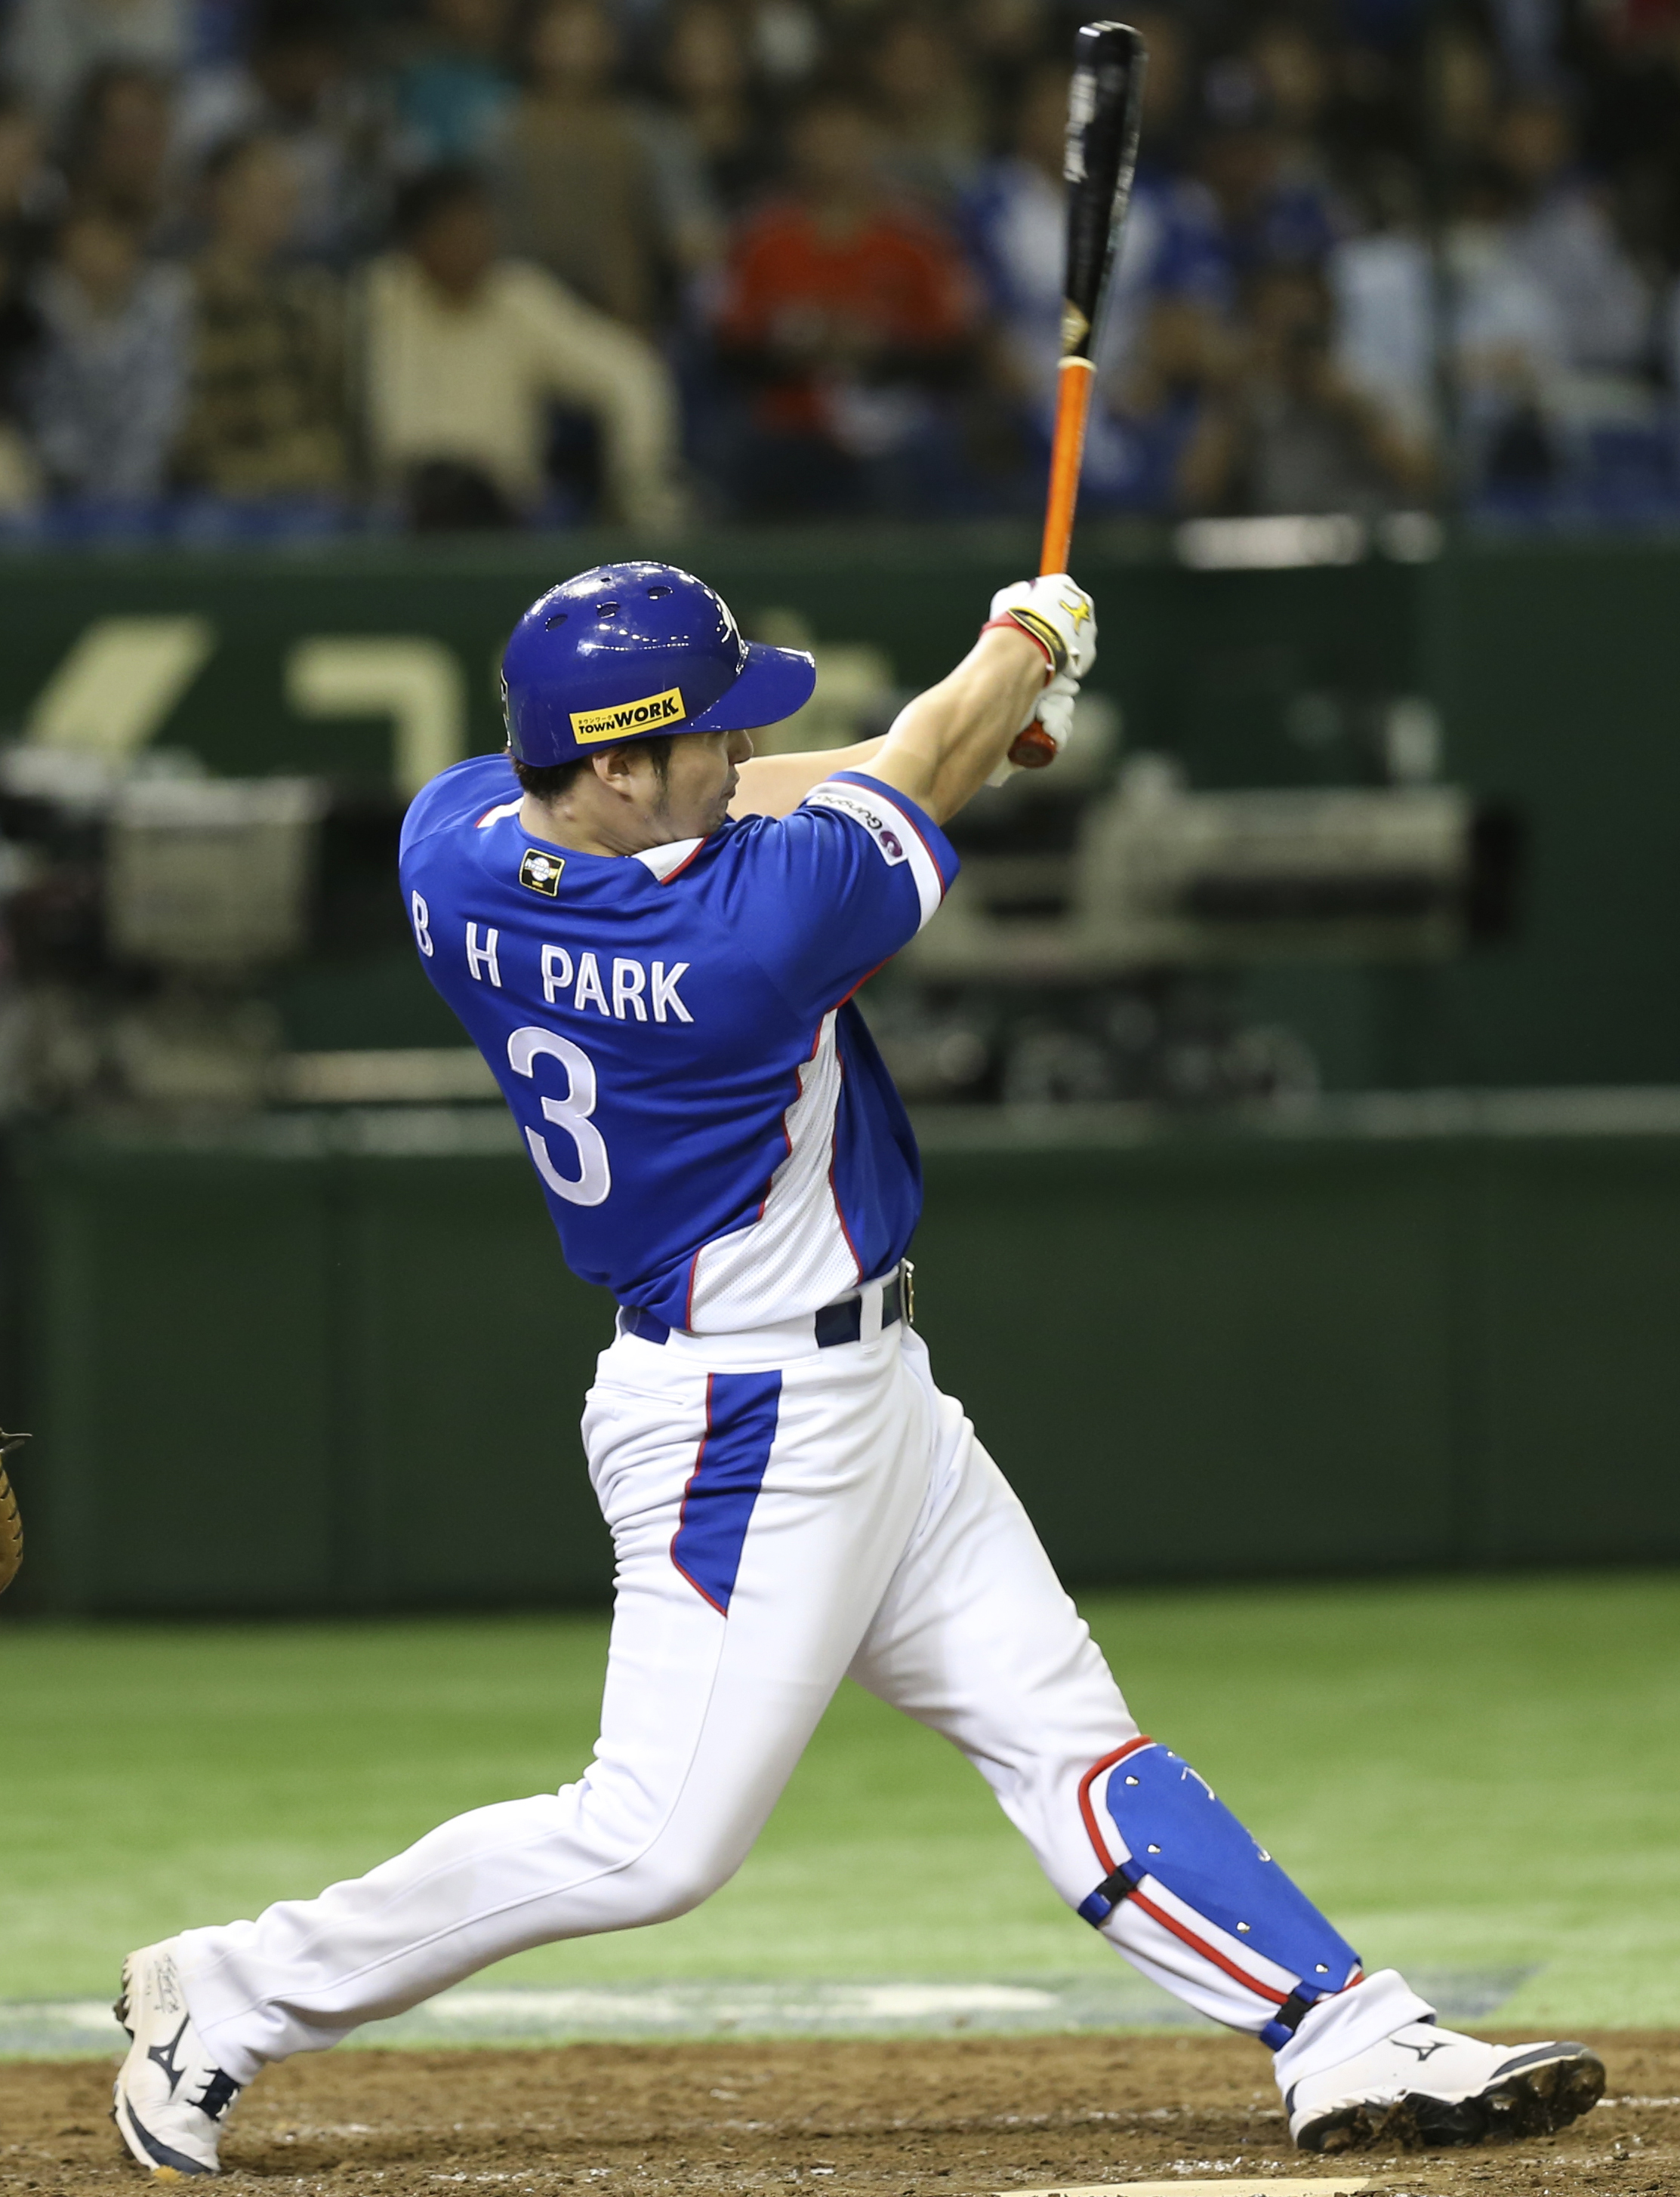 South Korea's Park Byung-ho hits a three-run home run against Team USA in the fourth inning of their final game at the Premier12 world baseball tournament at Tokyo Dome in Tokyo, Saturday, Nov. 21, 2015. (AP Photo/Koji Sasahara)